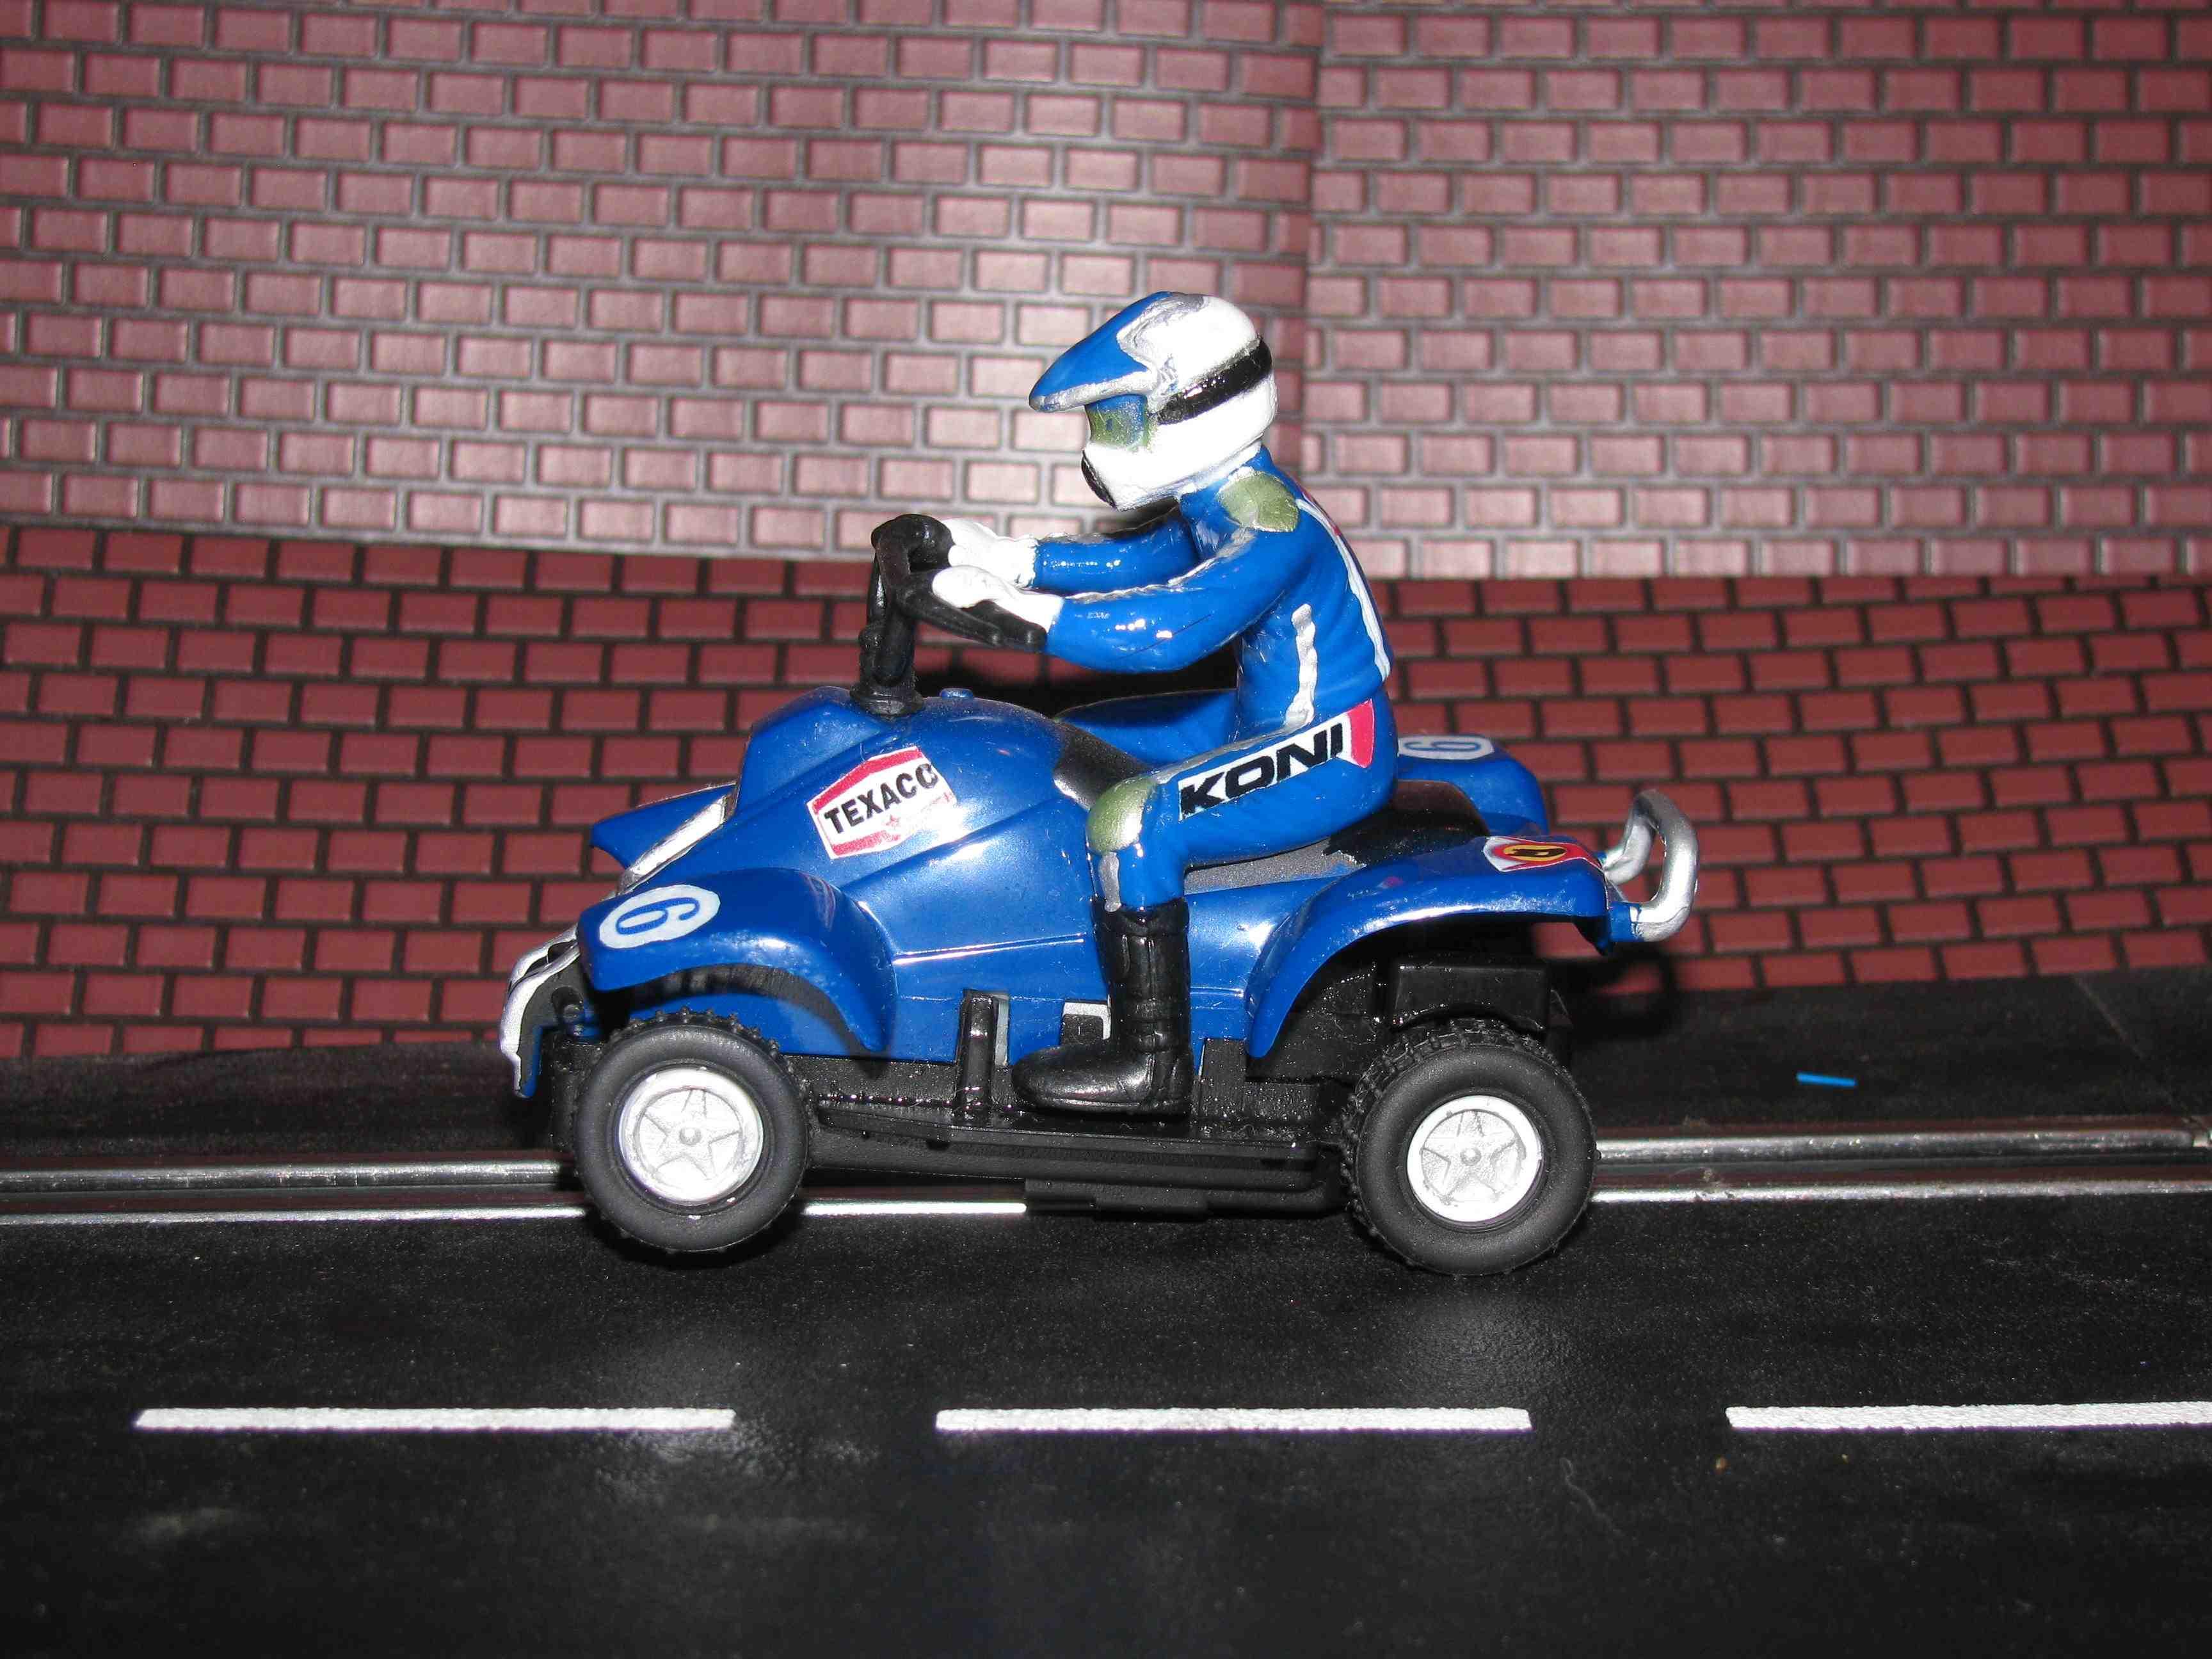 *** SOLD *** Slot Car 1/43 scale QUAD ATV Slot Car Racer #6 – Blue